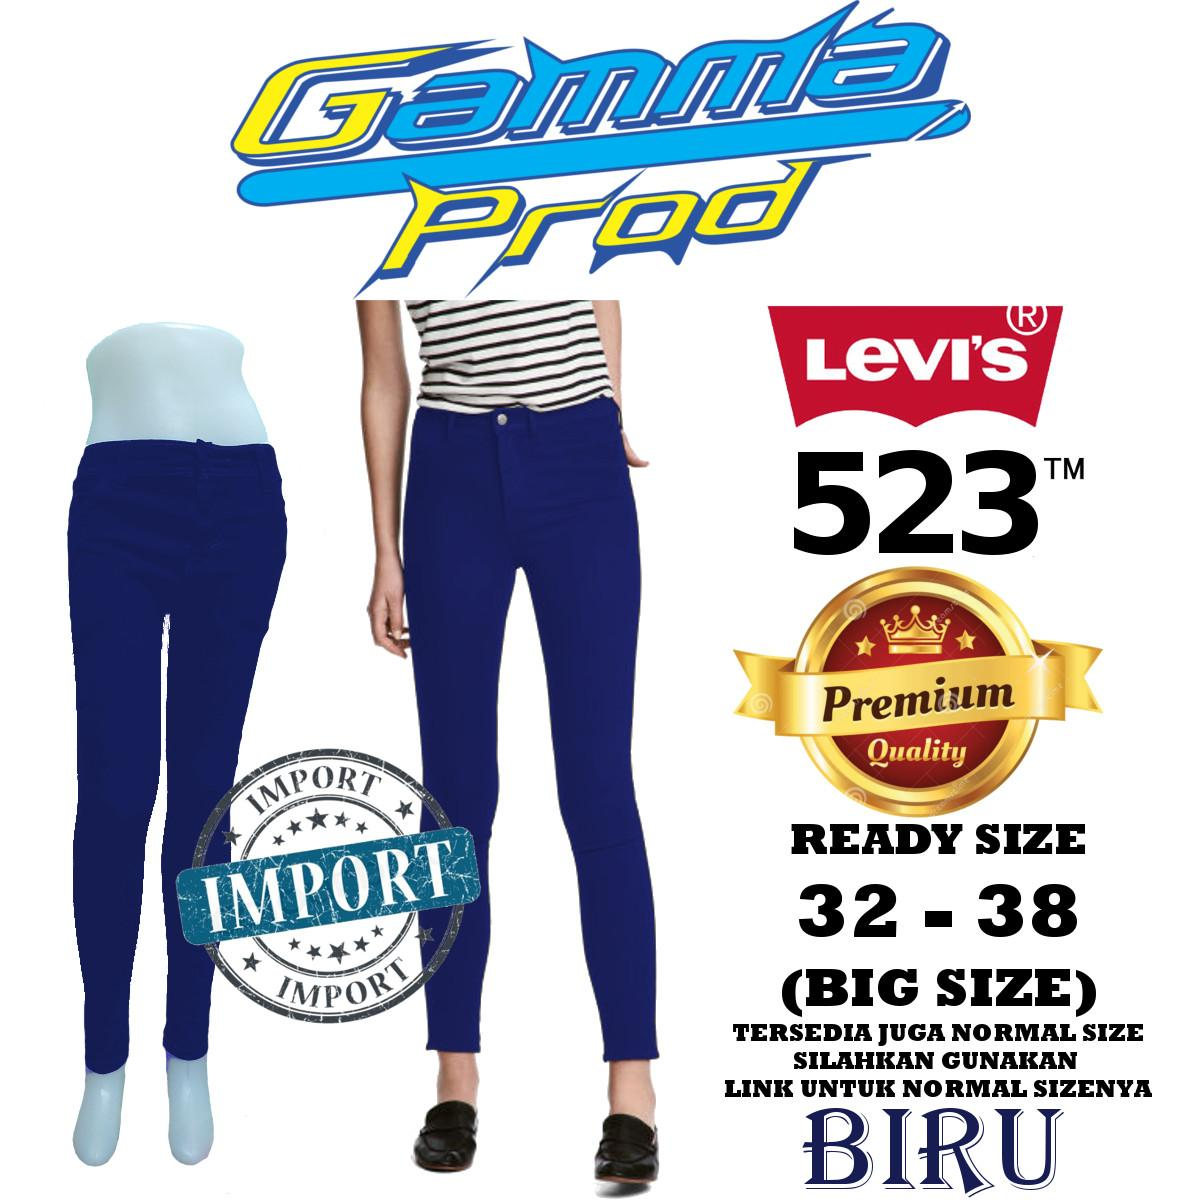 Celana Soft Jeans LEVIS 523 BIRU Skinny WANITA PREMIUM Zipper YKK BIG SIZE